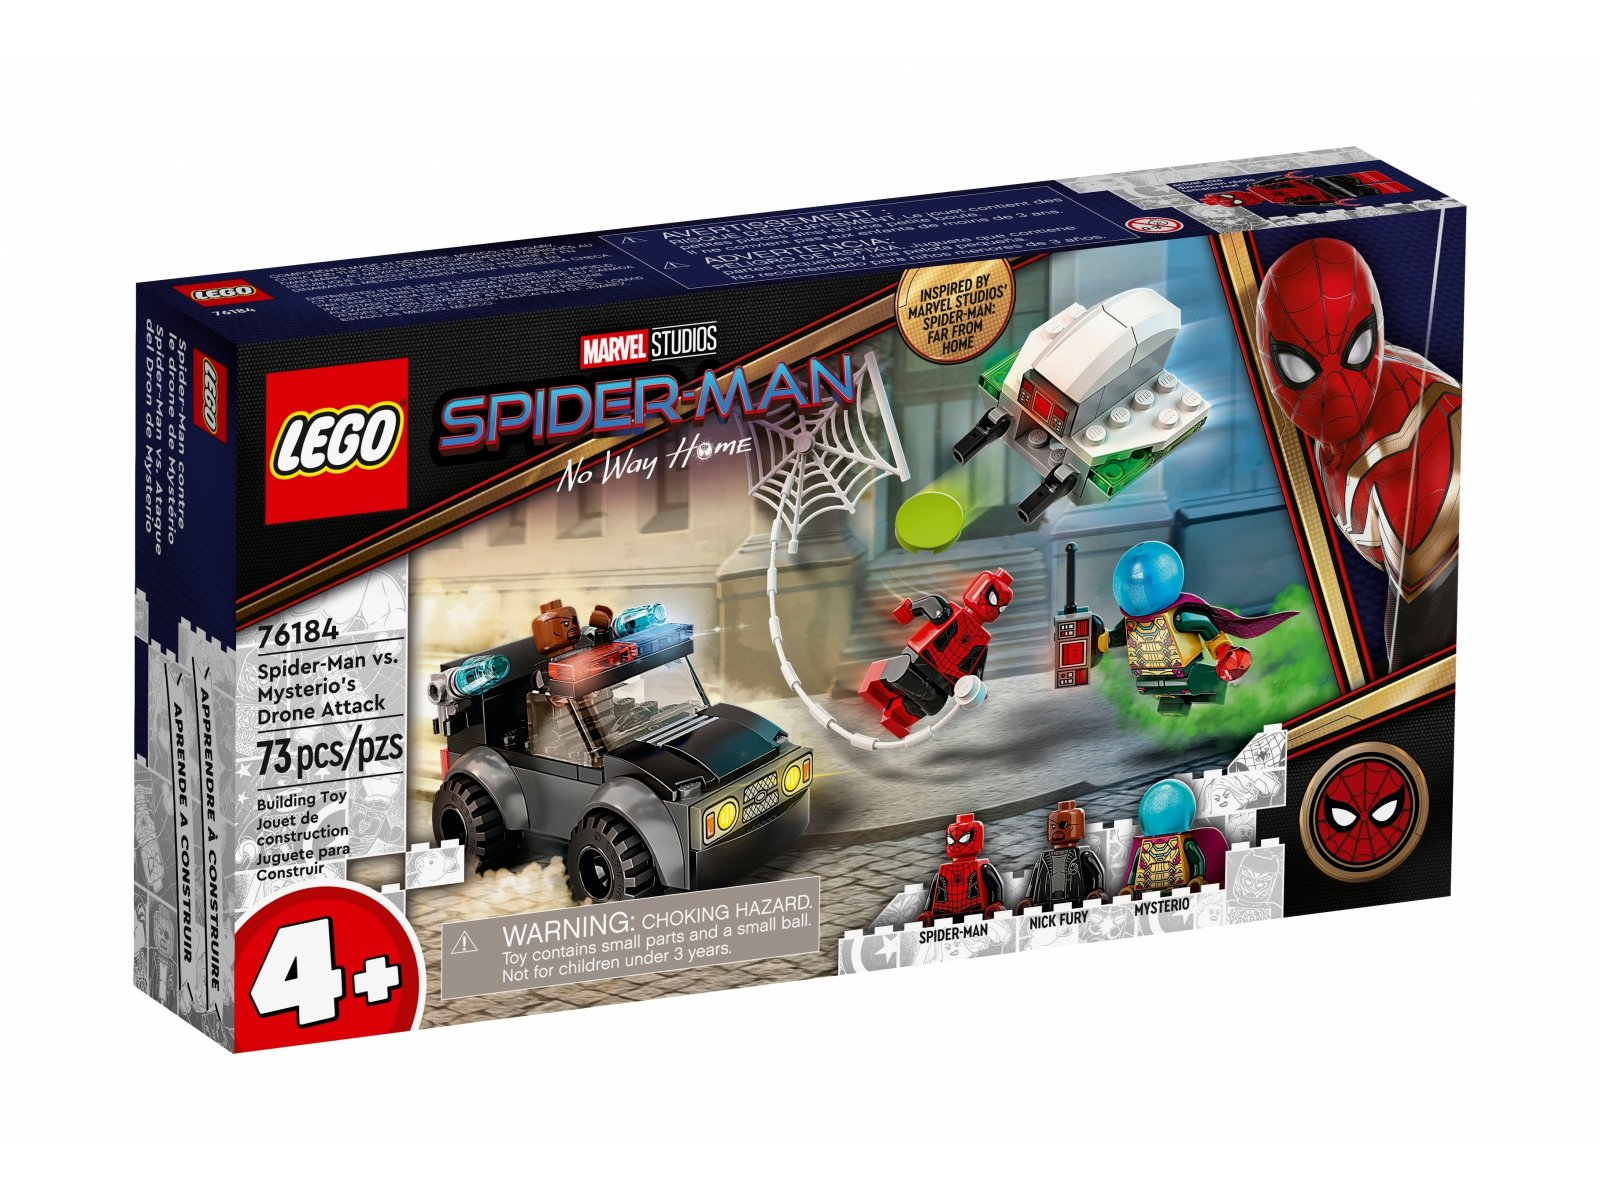 LEGO Marvel Spider-Man kontra Mysterio i jego dron 76184